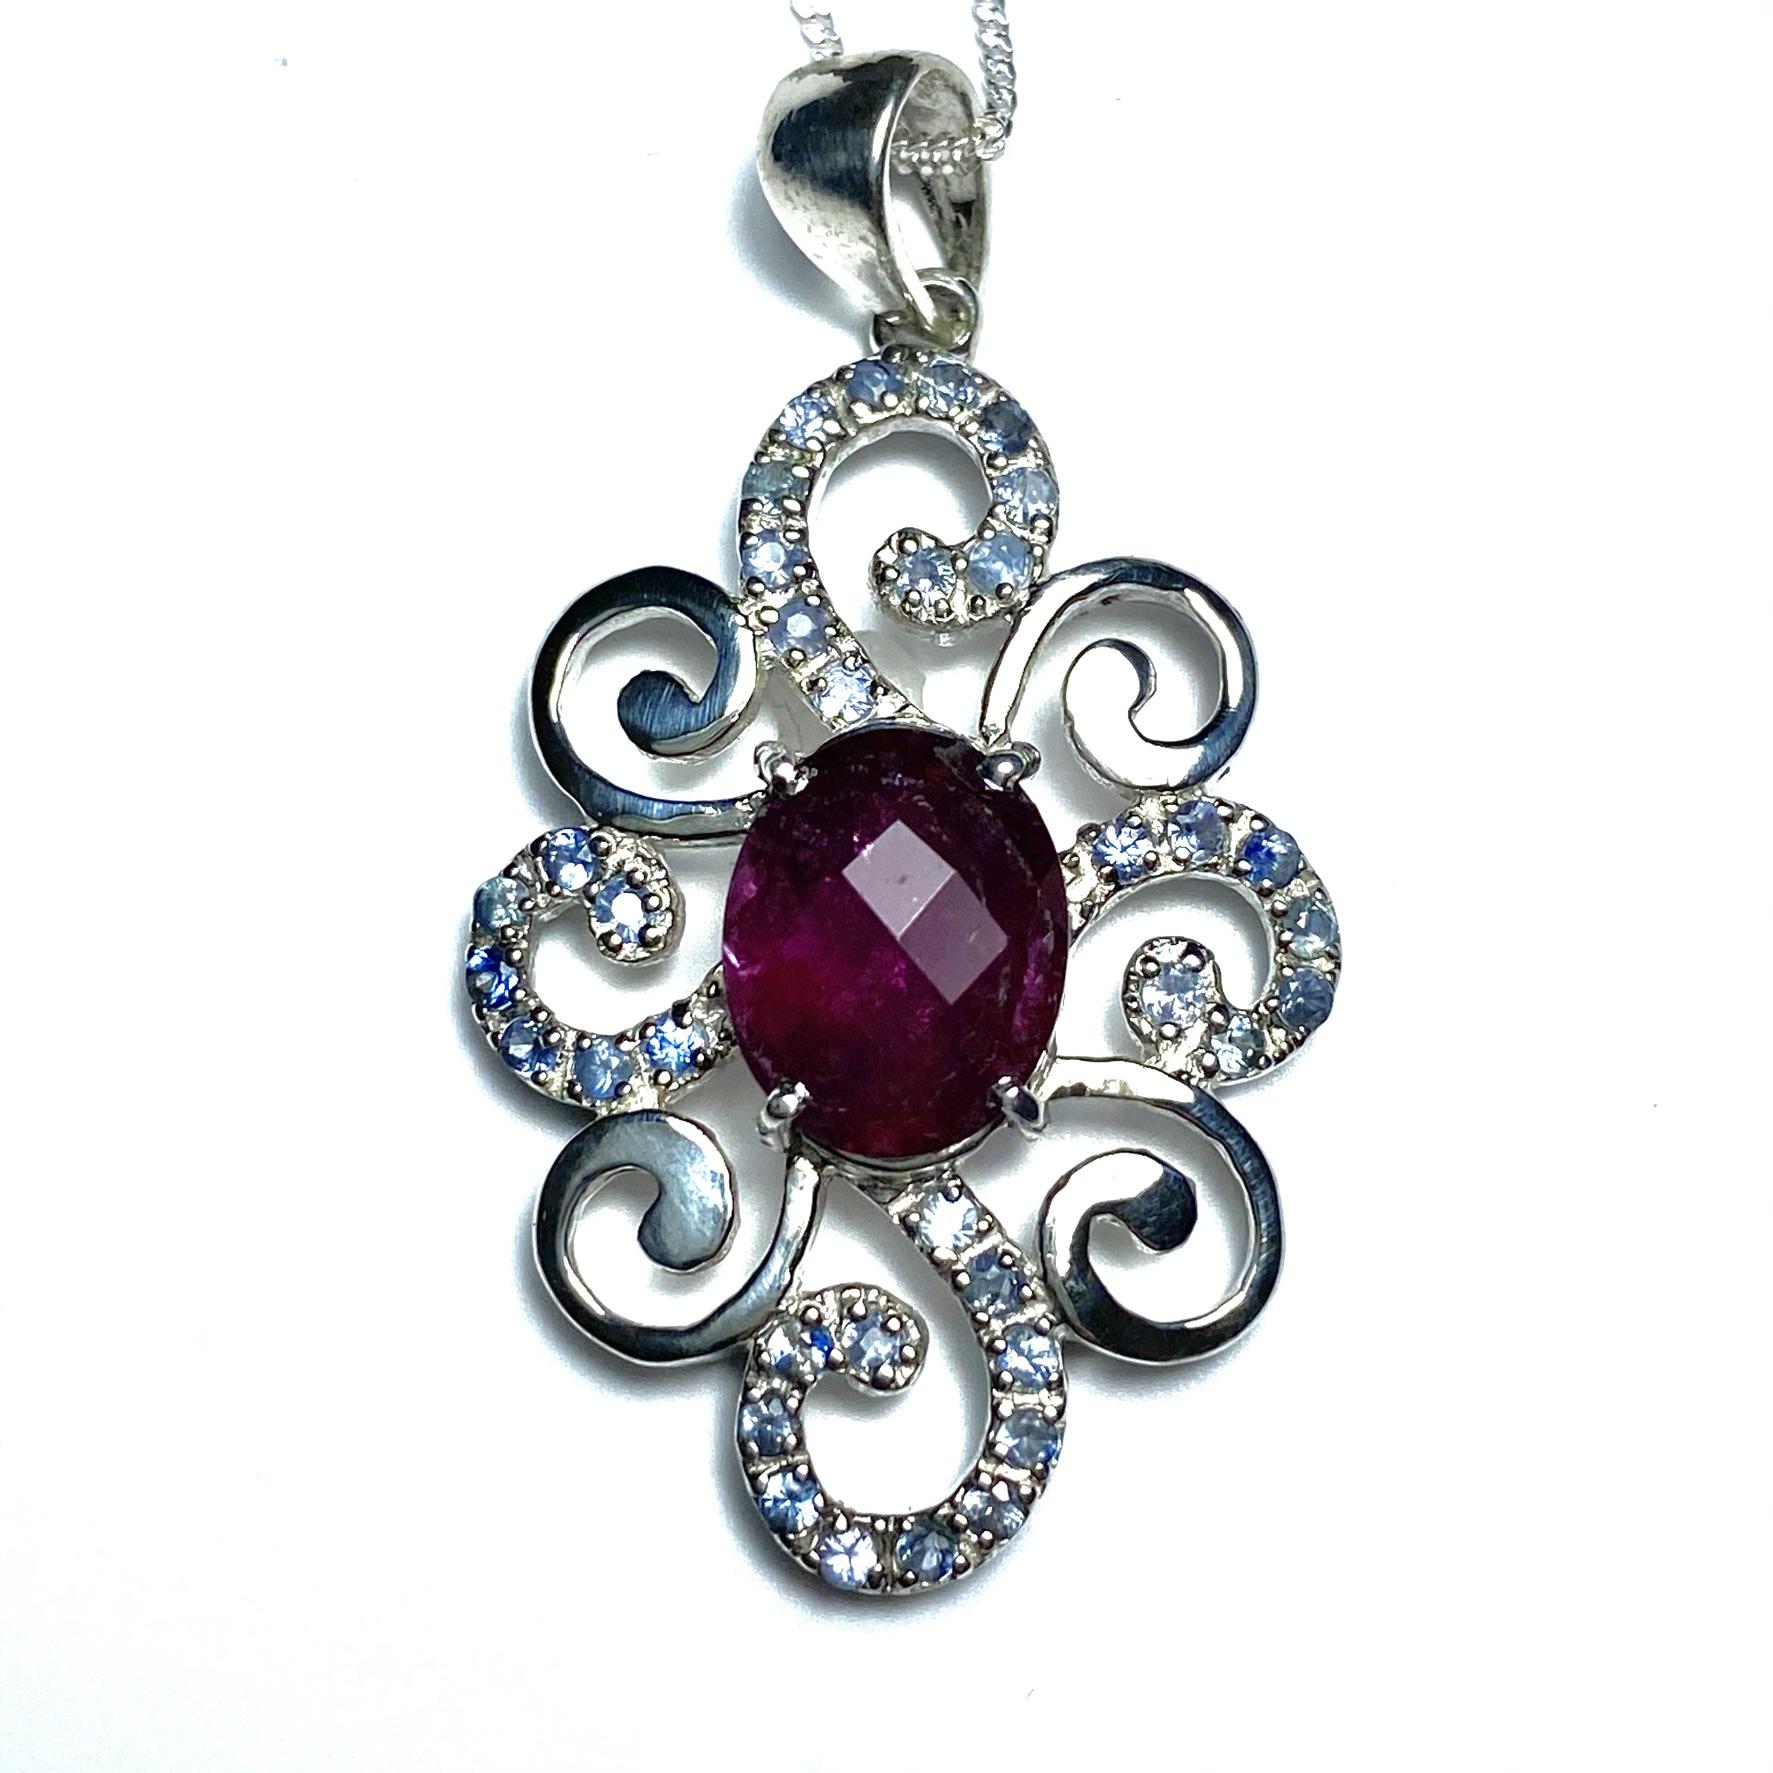 Rubellite tourmaline & sapphires pendant